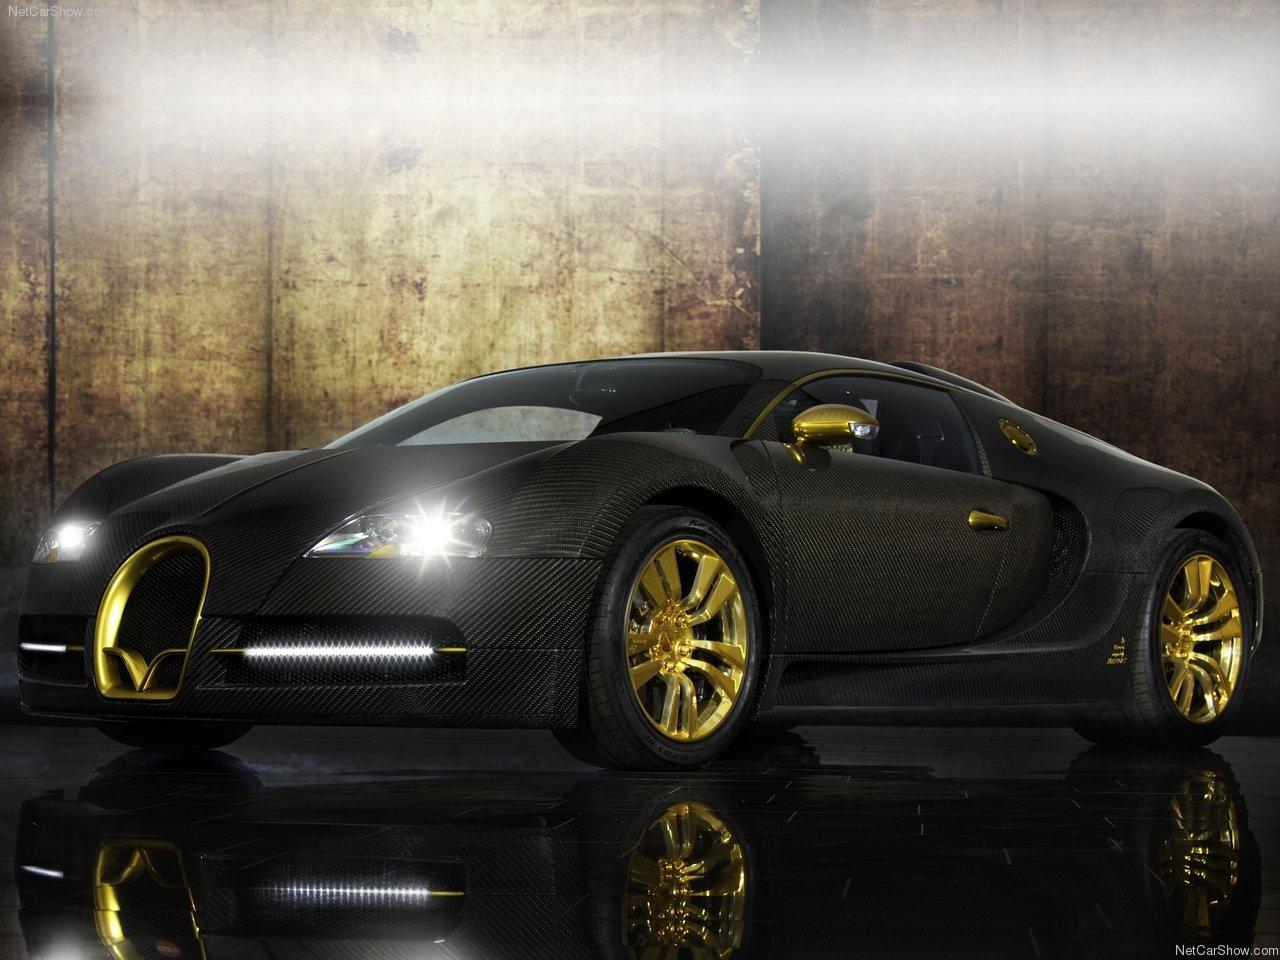 http://3.bp.blogspot.com/_cLWqMZQ1CPk/TUBZYjgpaoI/AAAAAAAAGp4/rxv7jI1AIRs/s1600/Mansory-Bugatti-Veyron-Linea-Vincero-dOro-2010.jpg